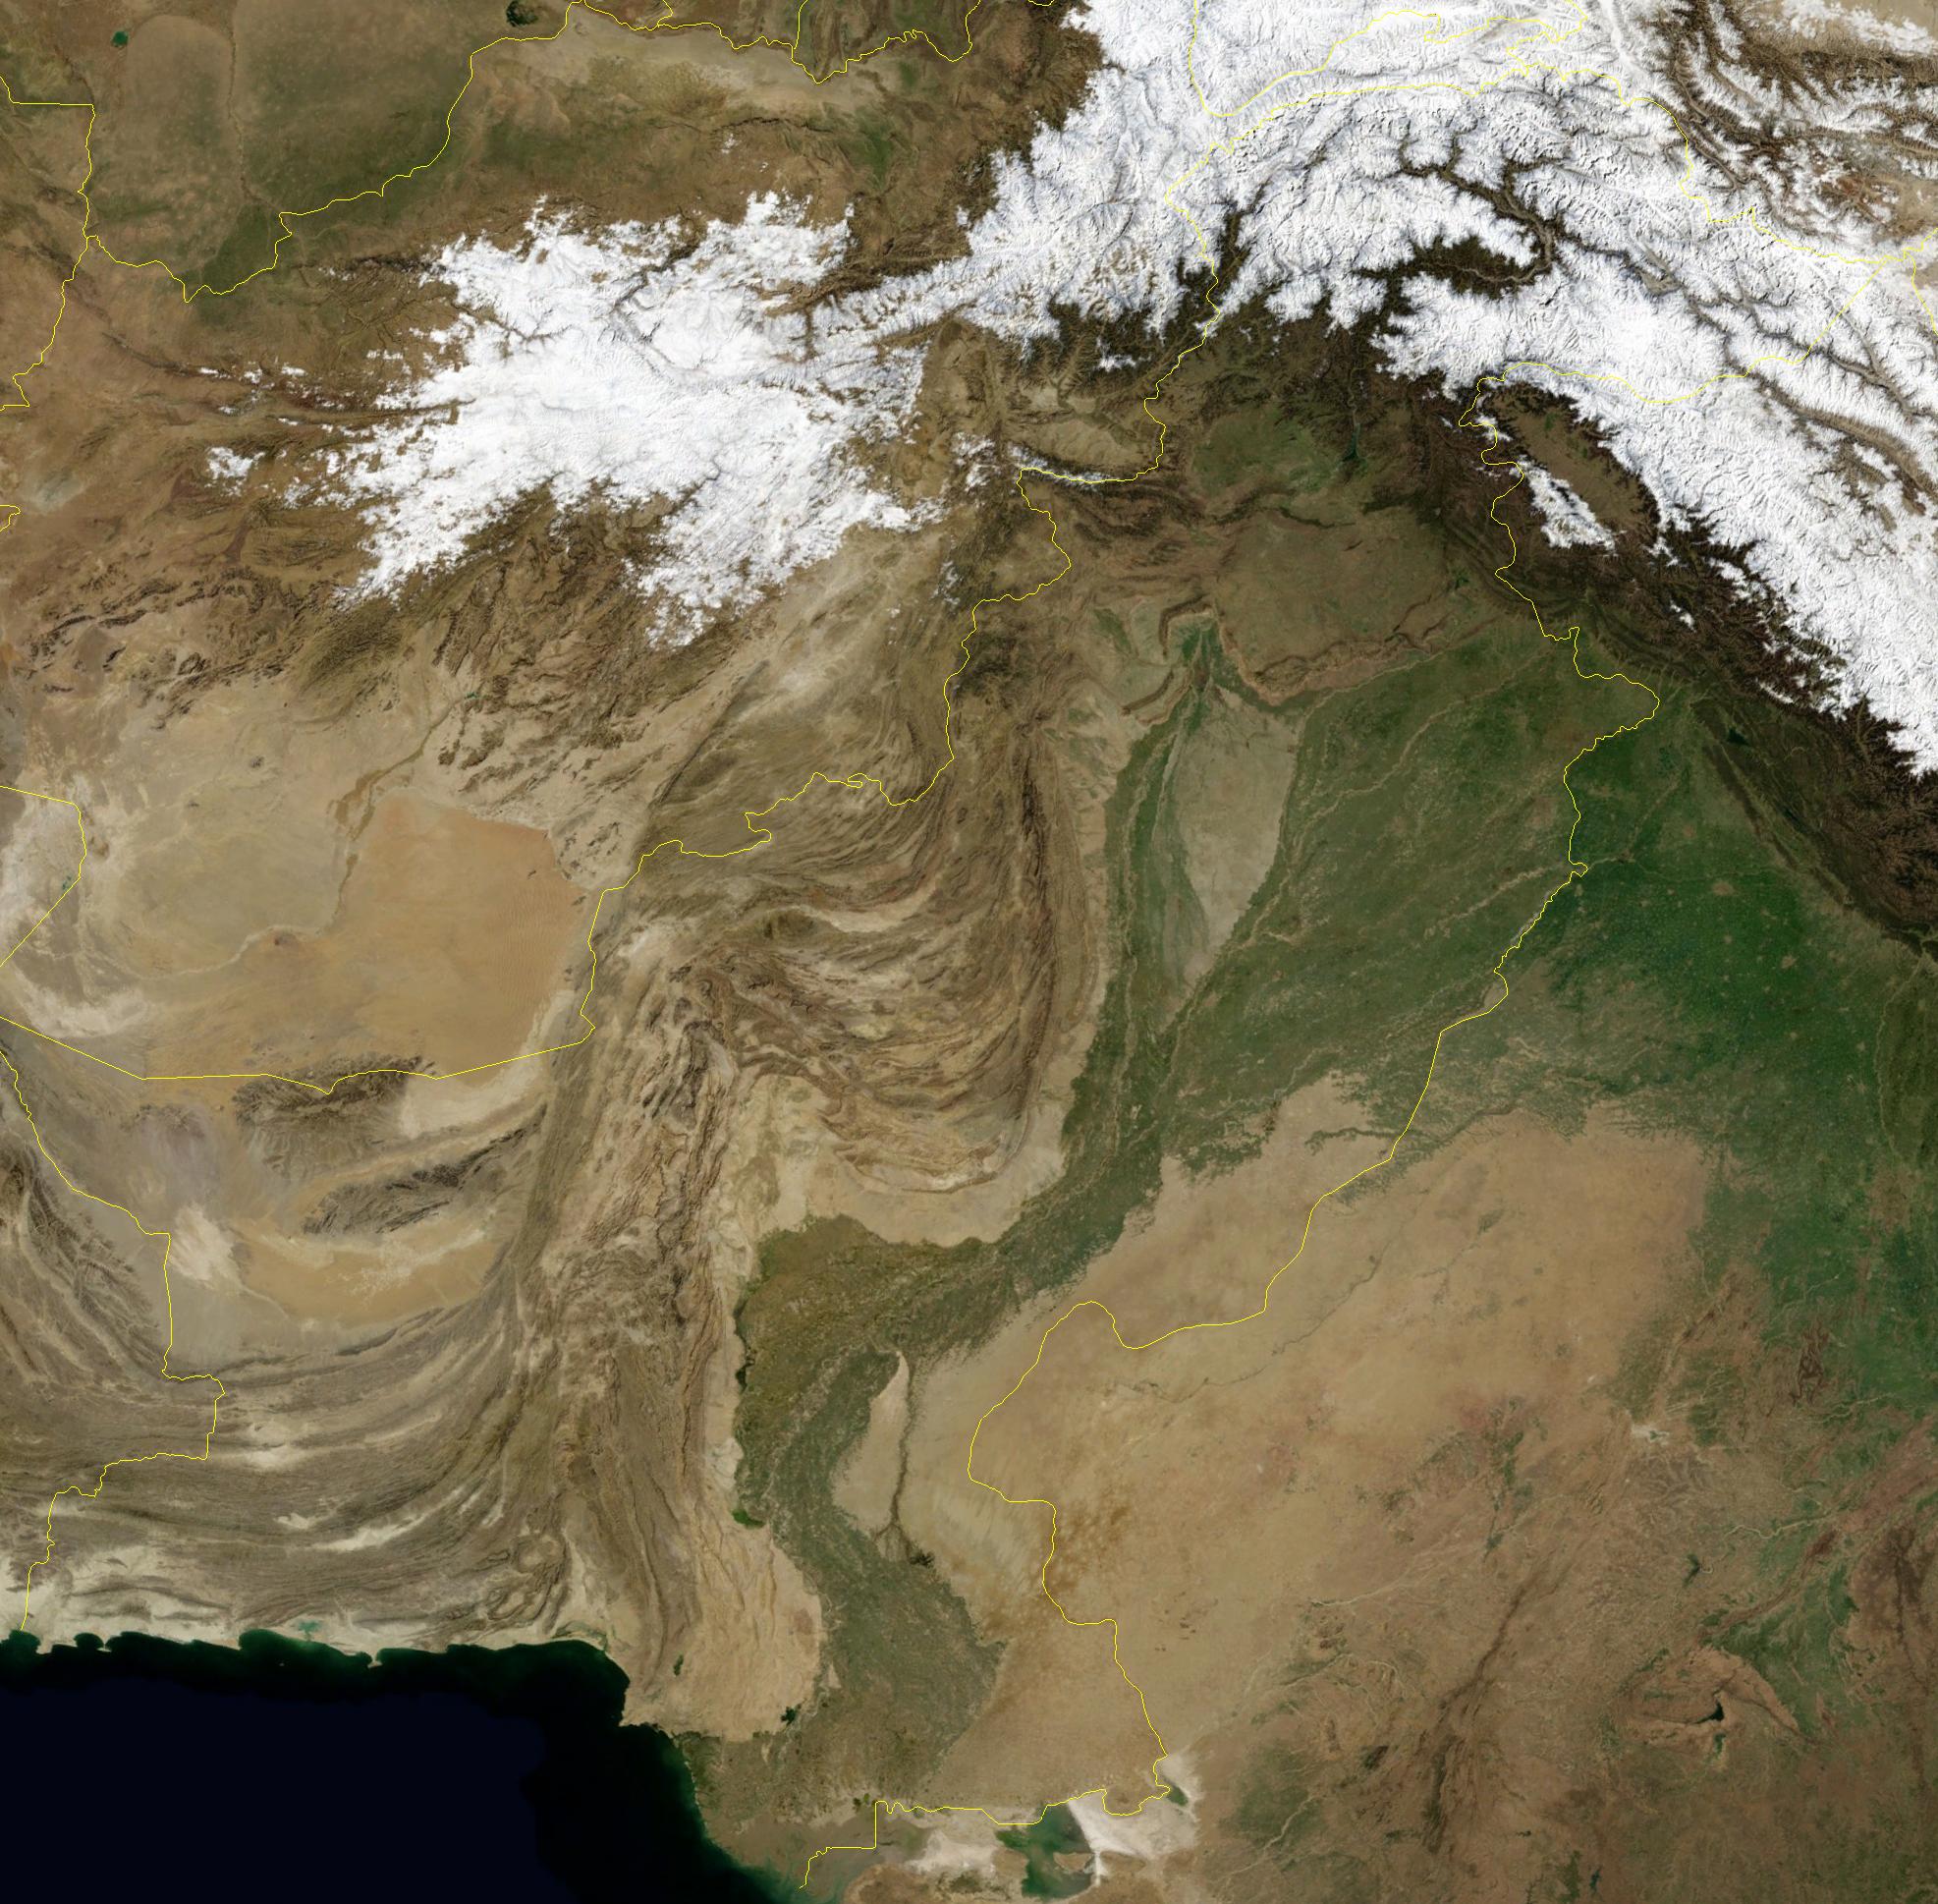 Pakistan Map Through Satellite - Map through satellite